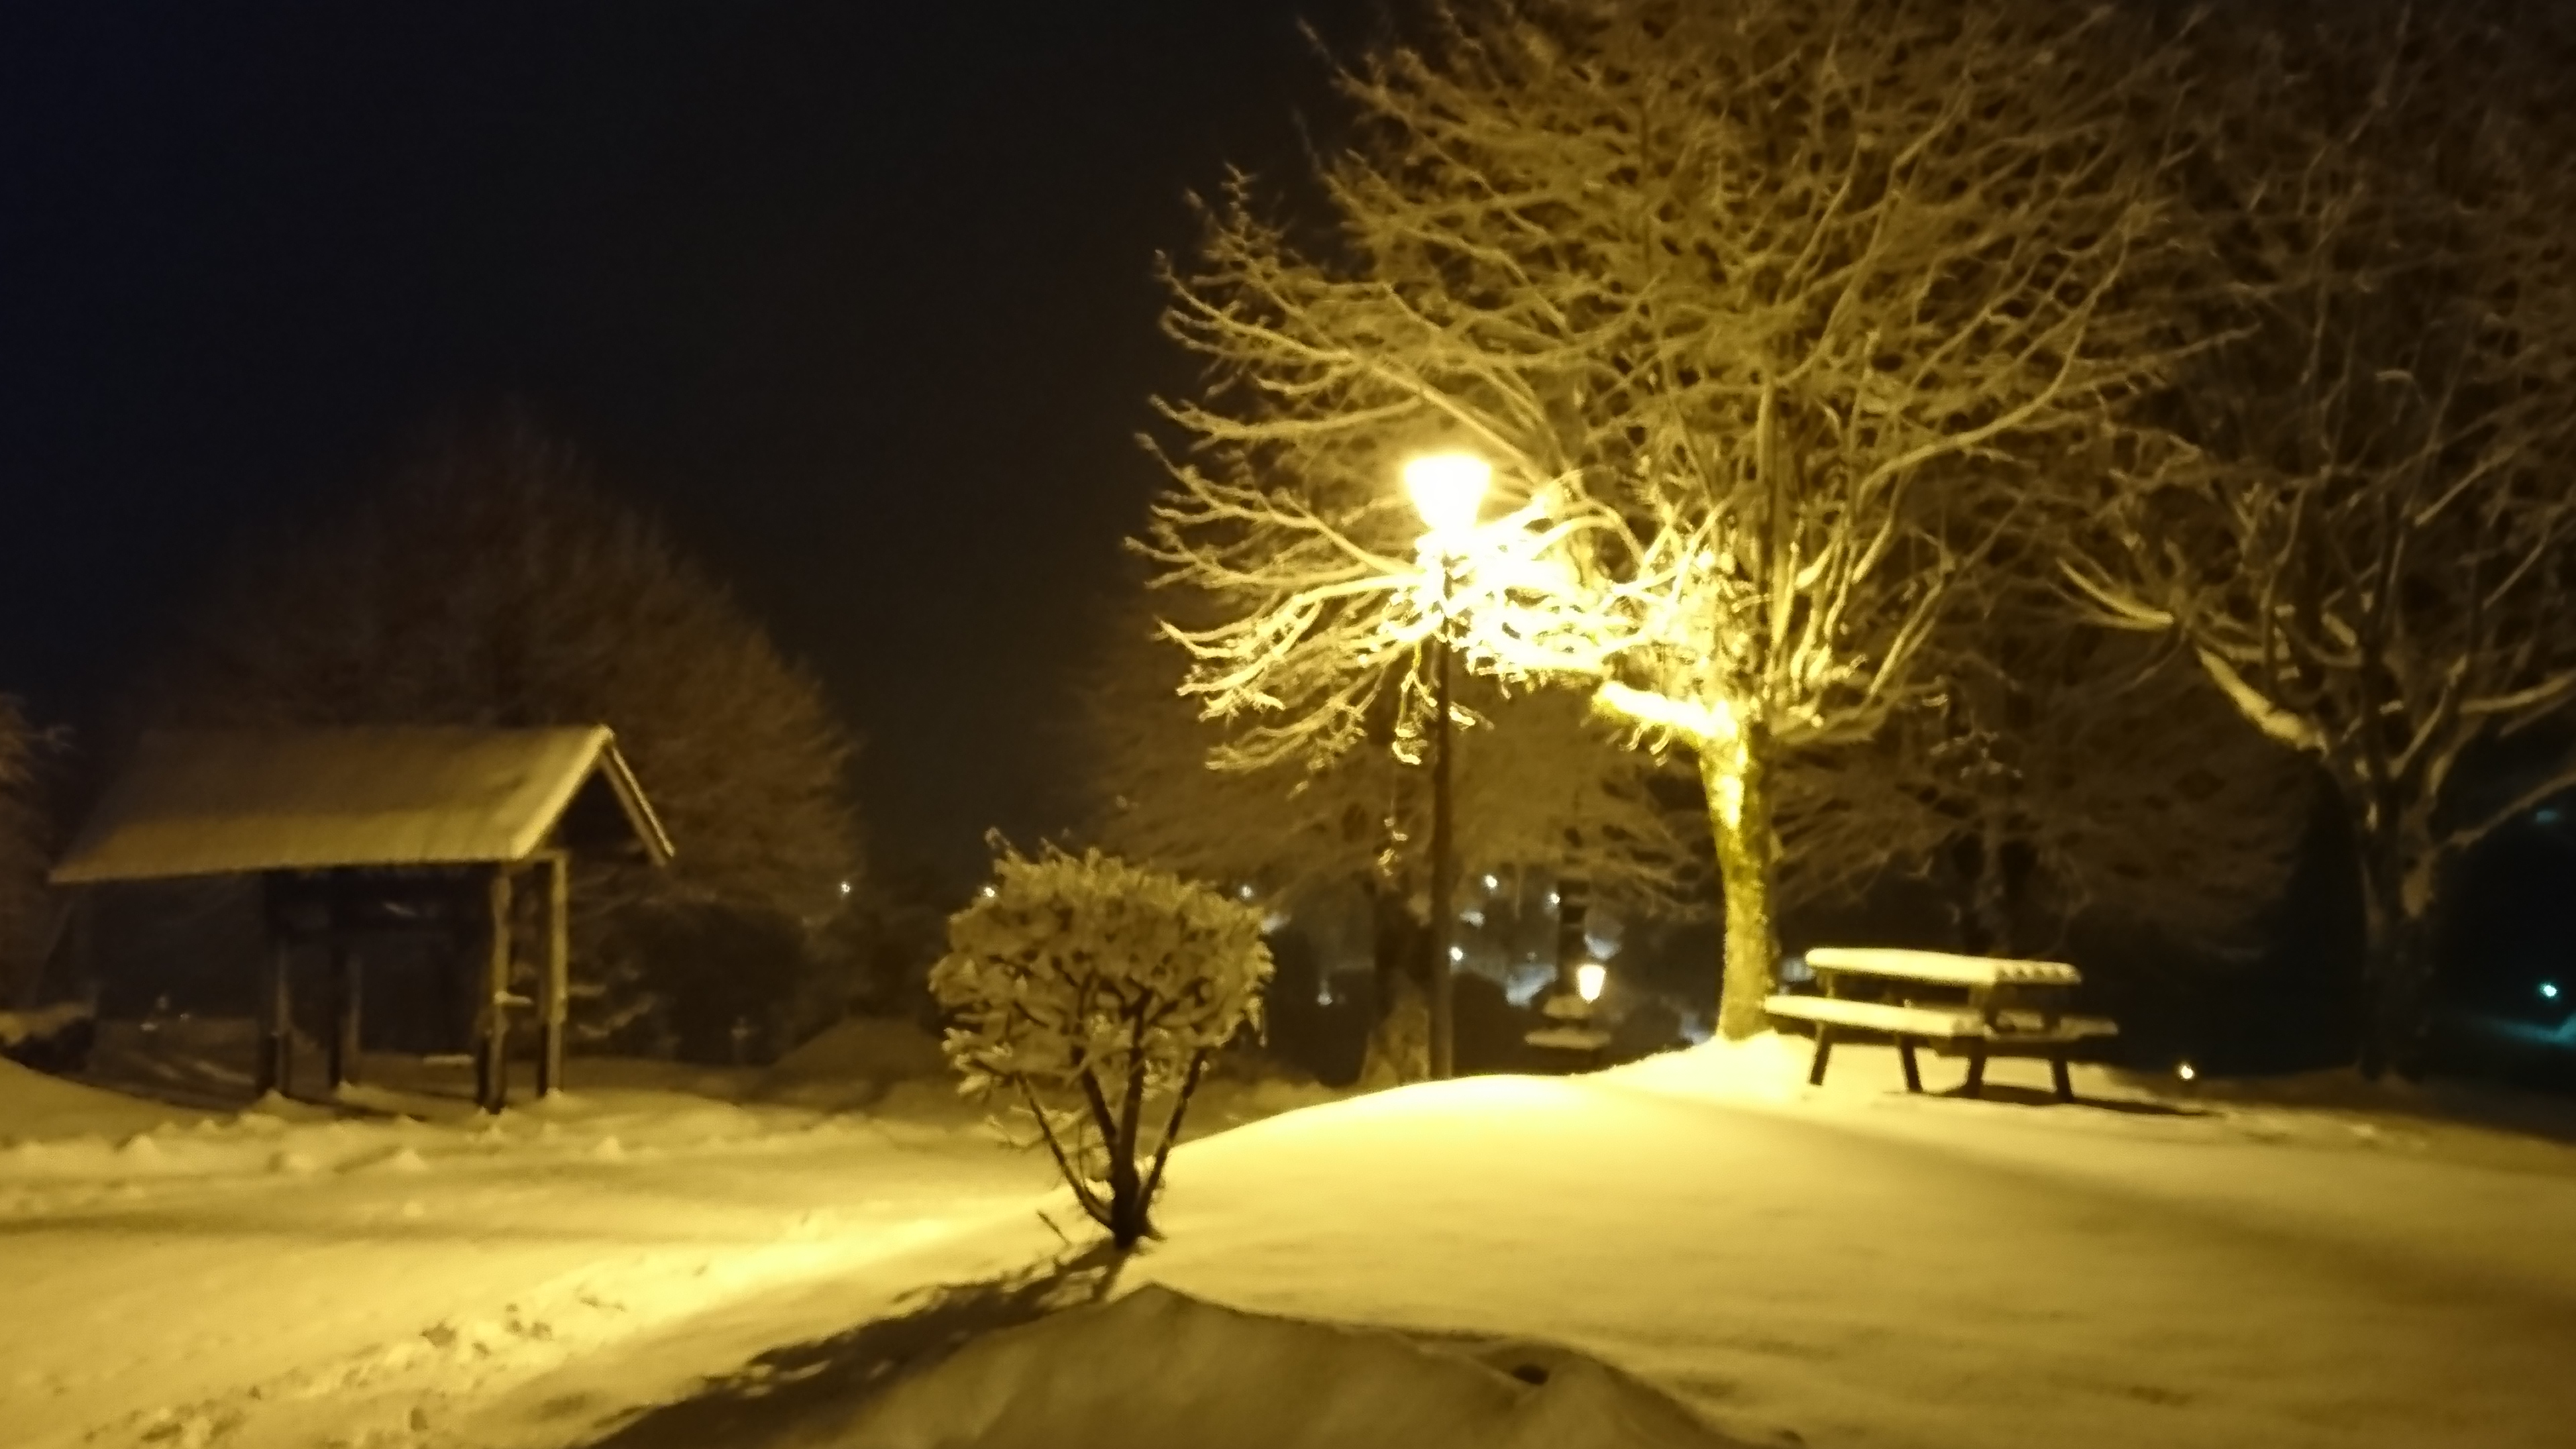 nuit dans la neige...plénitude